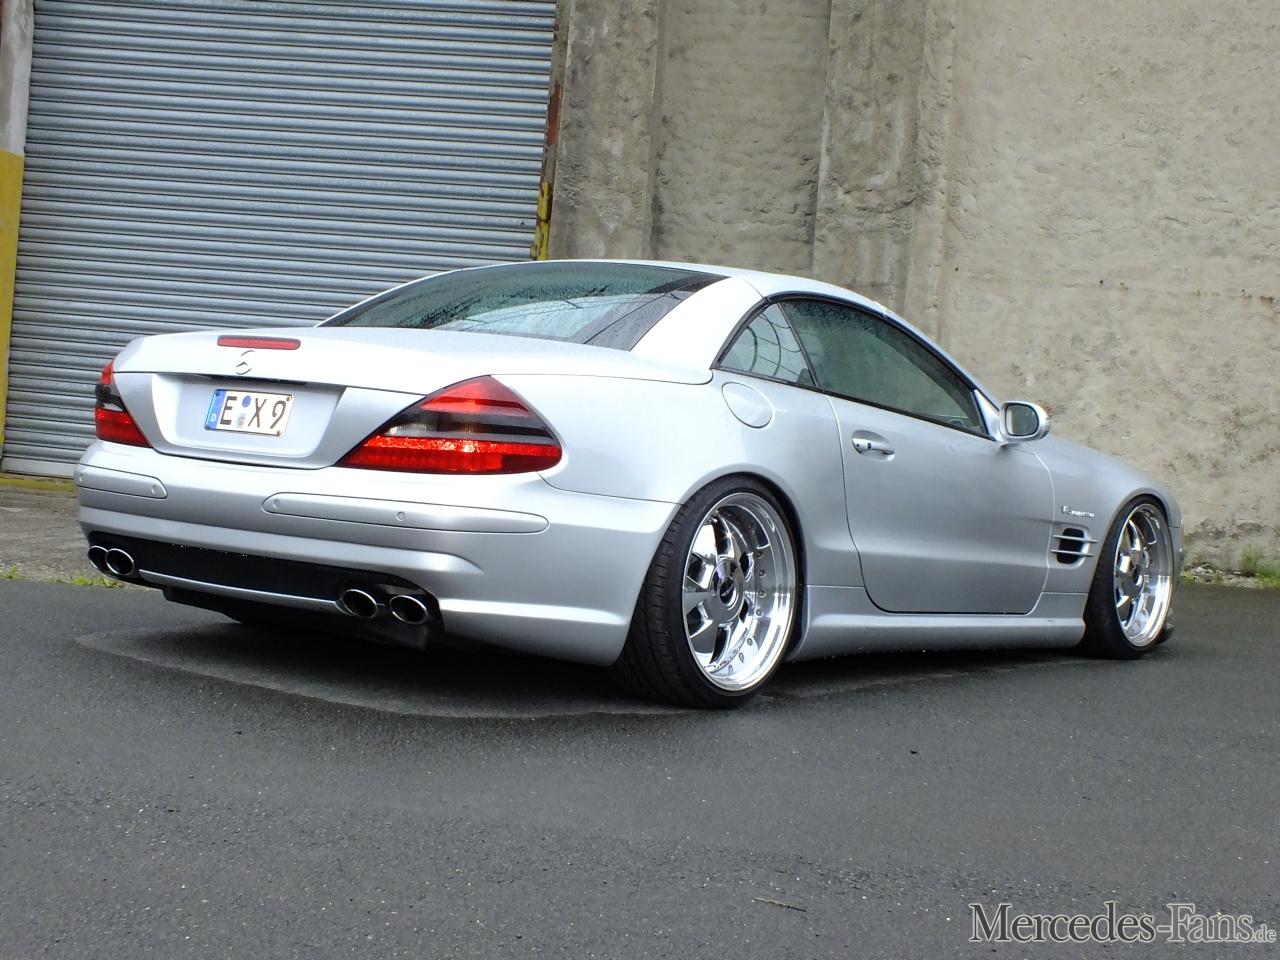 Powertyp 2002er Mercedes Sl55 Amg 500 Ps Starker R230